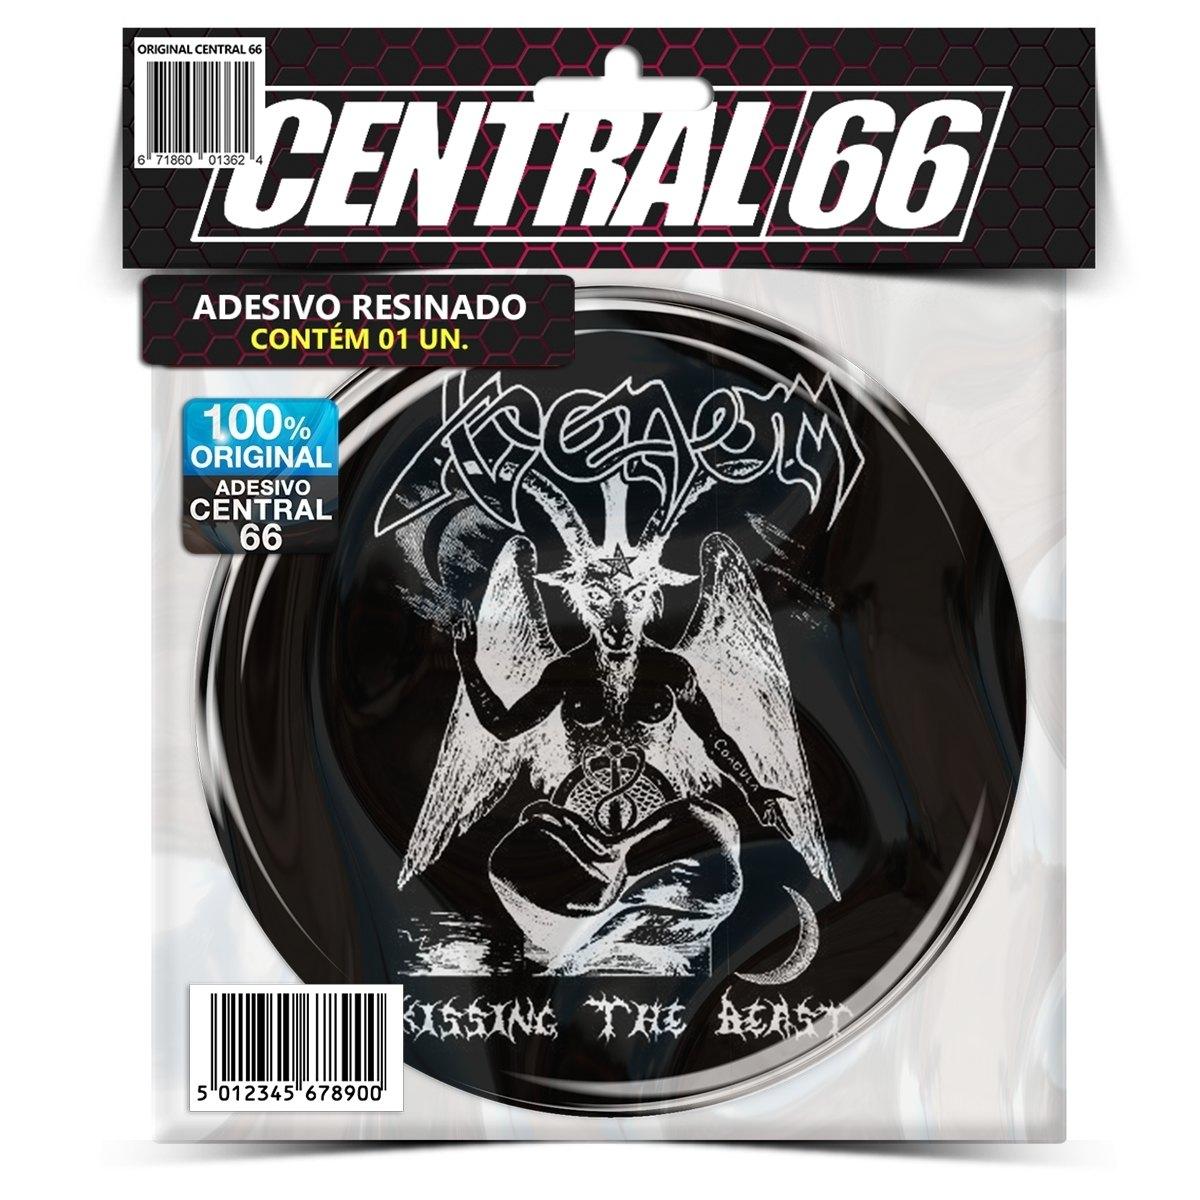 Adesivo Redondo Venom Kissing the Beast – Central 66